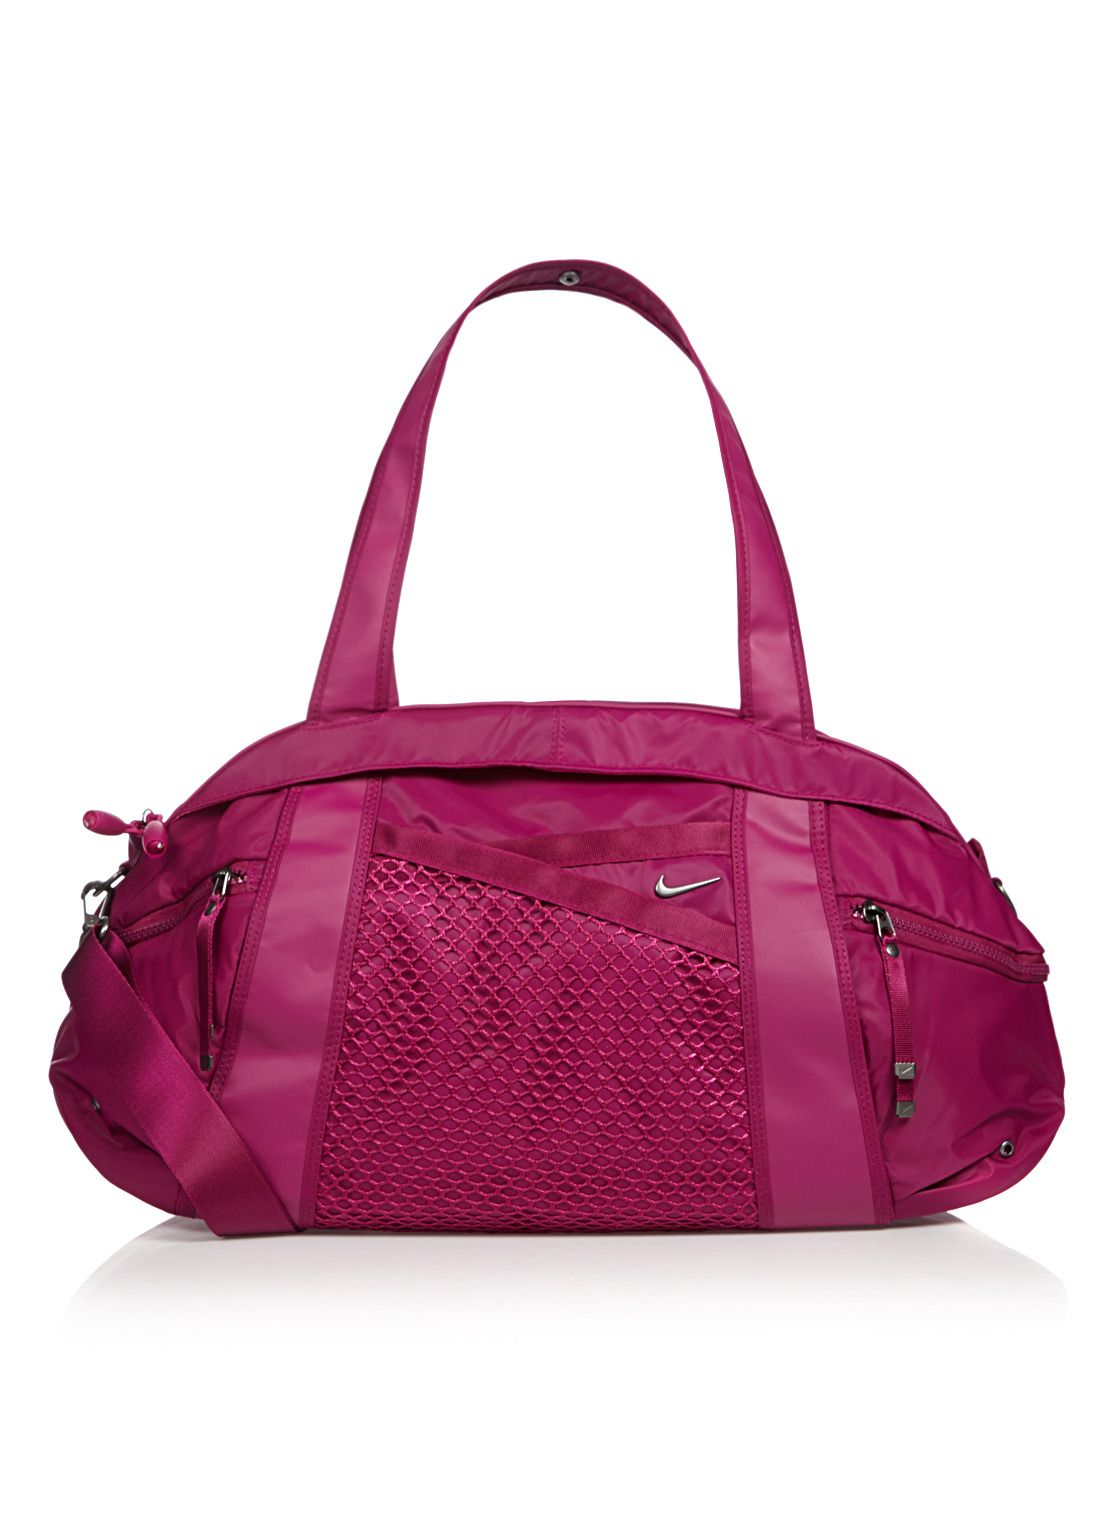 45e1338d83 Nike Sporttas Victory Gym Club • de Bijenkorf